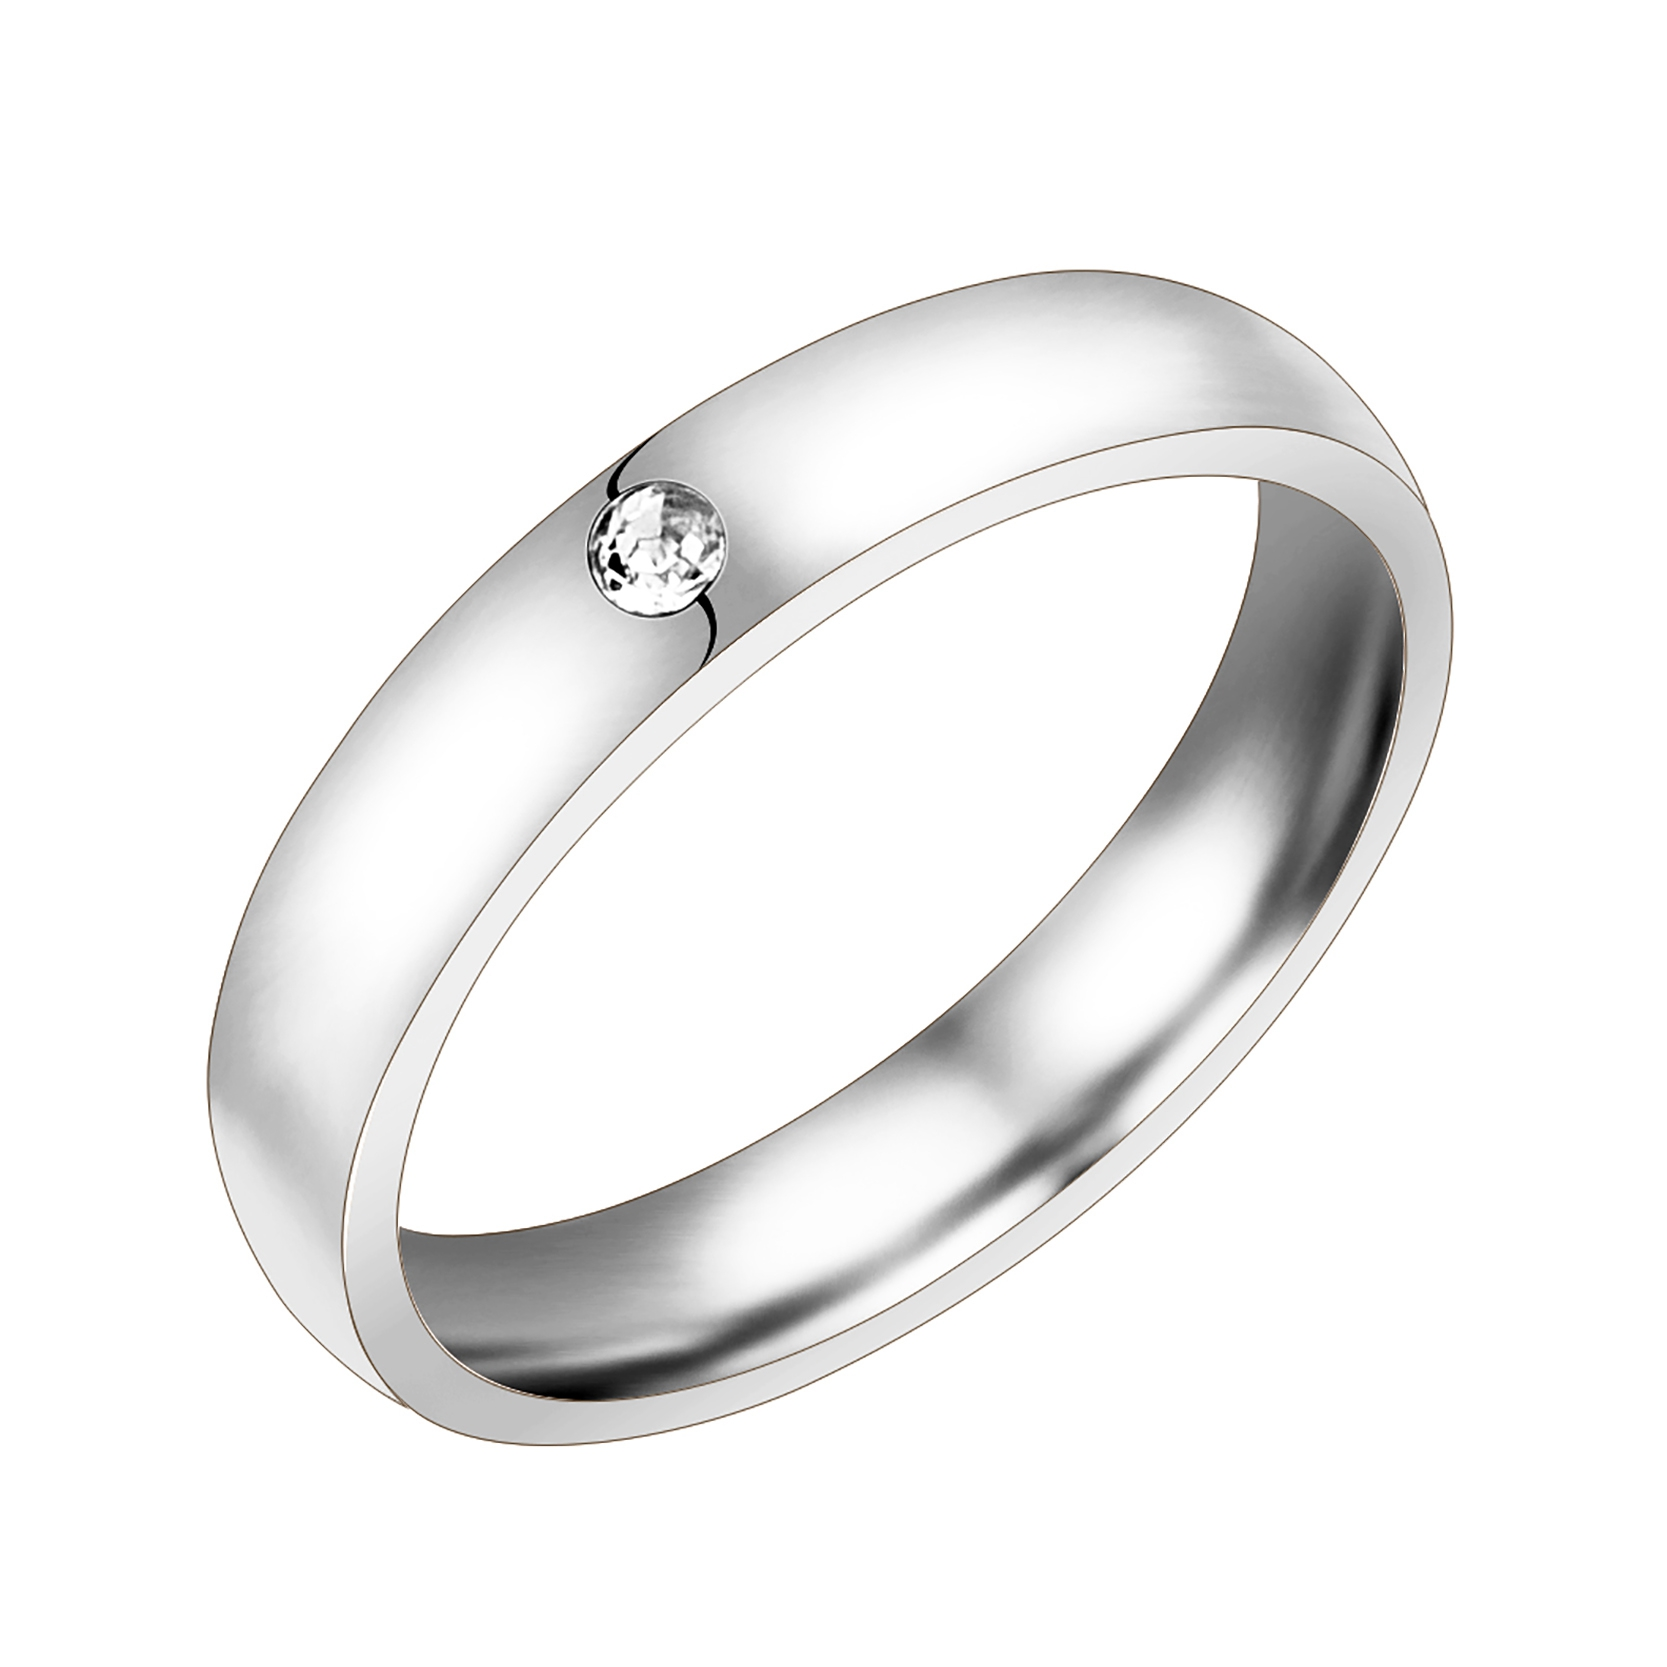 New Sterns Mens Wedding Rings Wedding